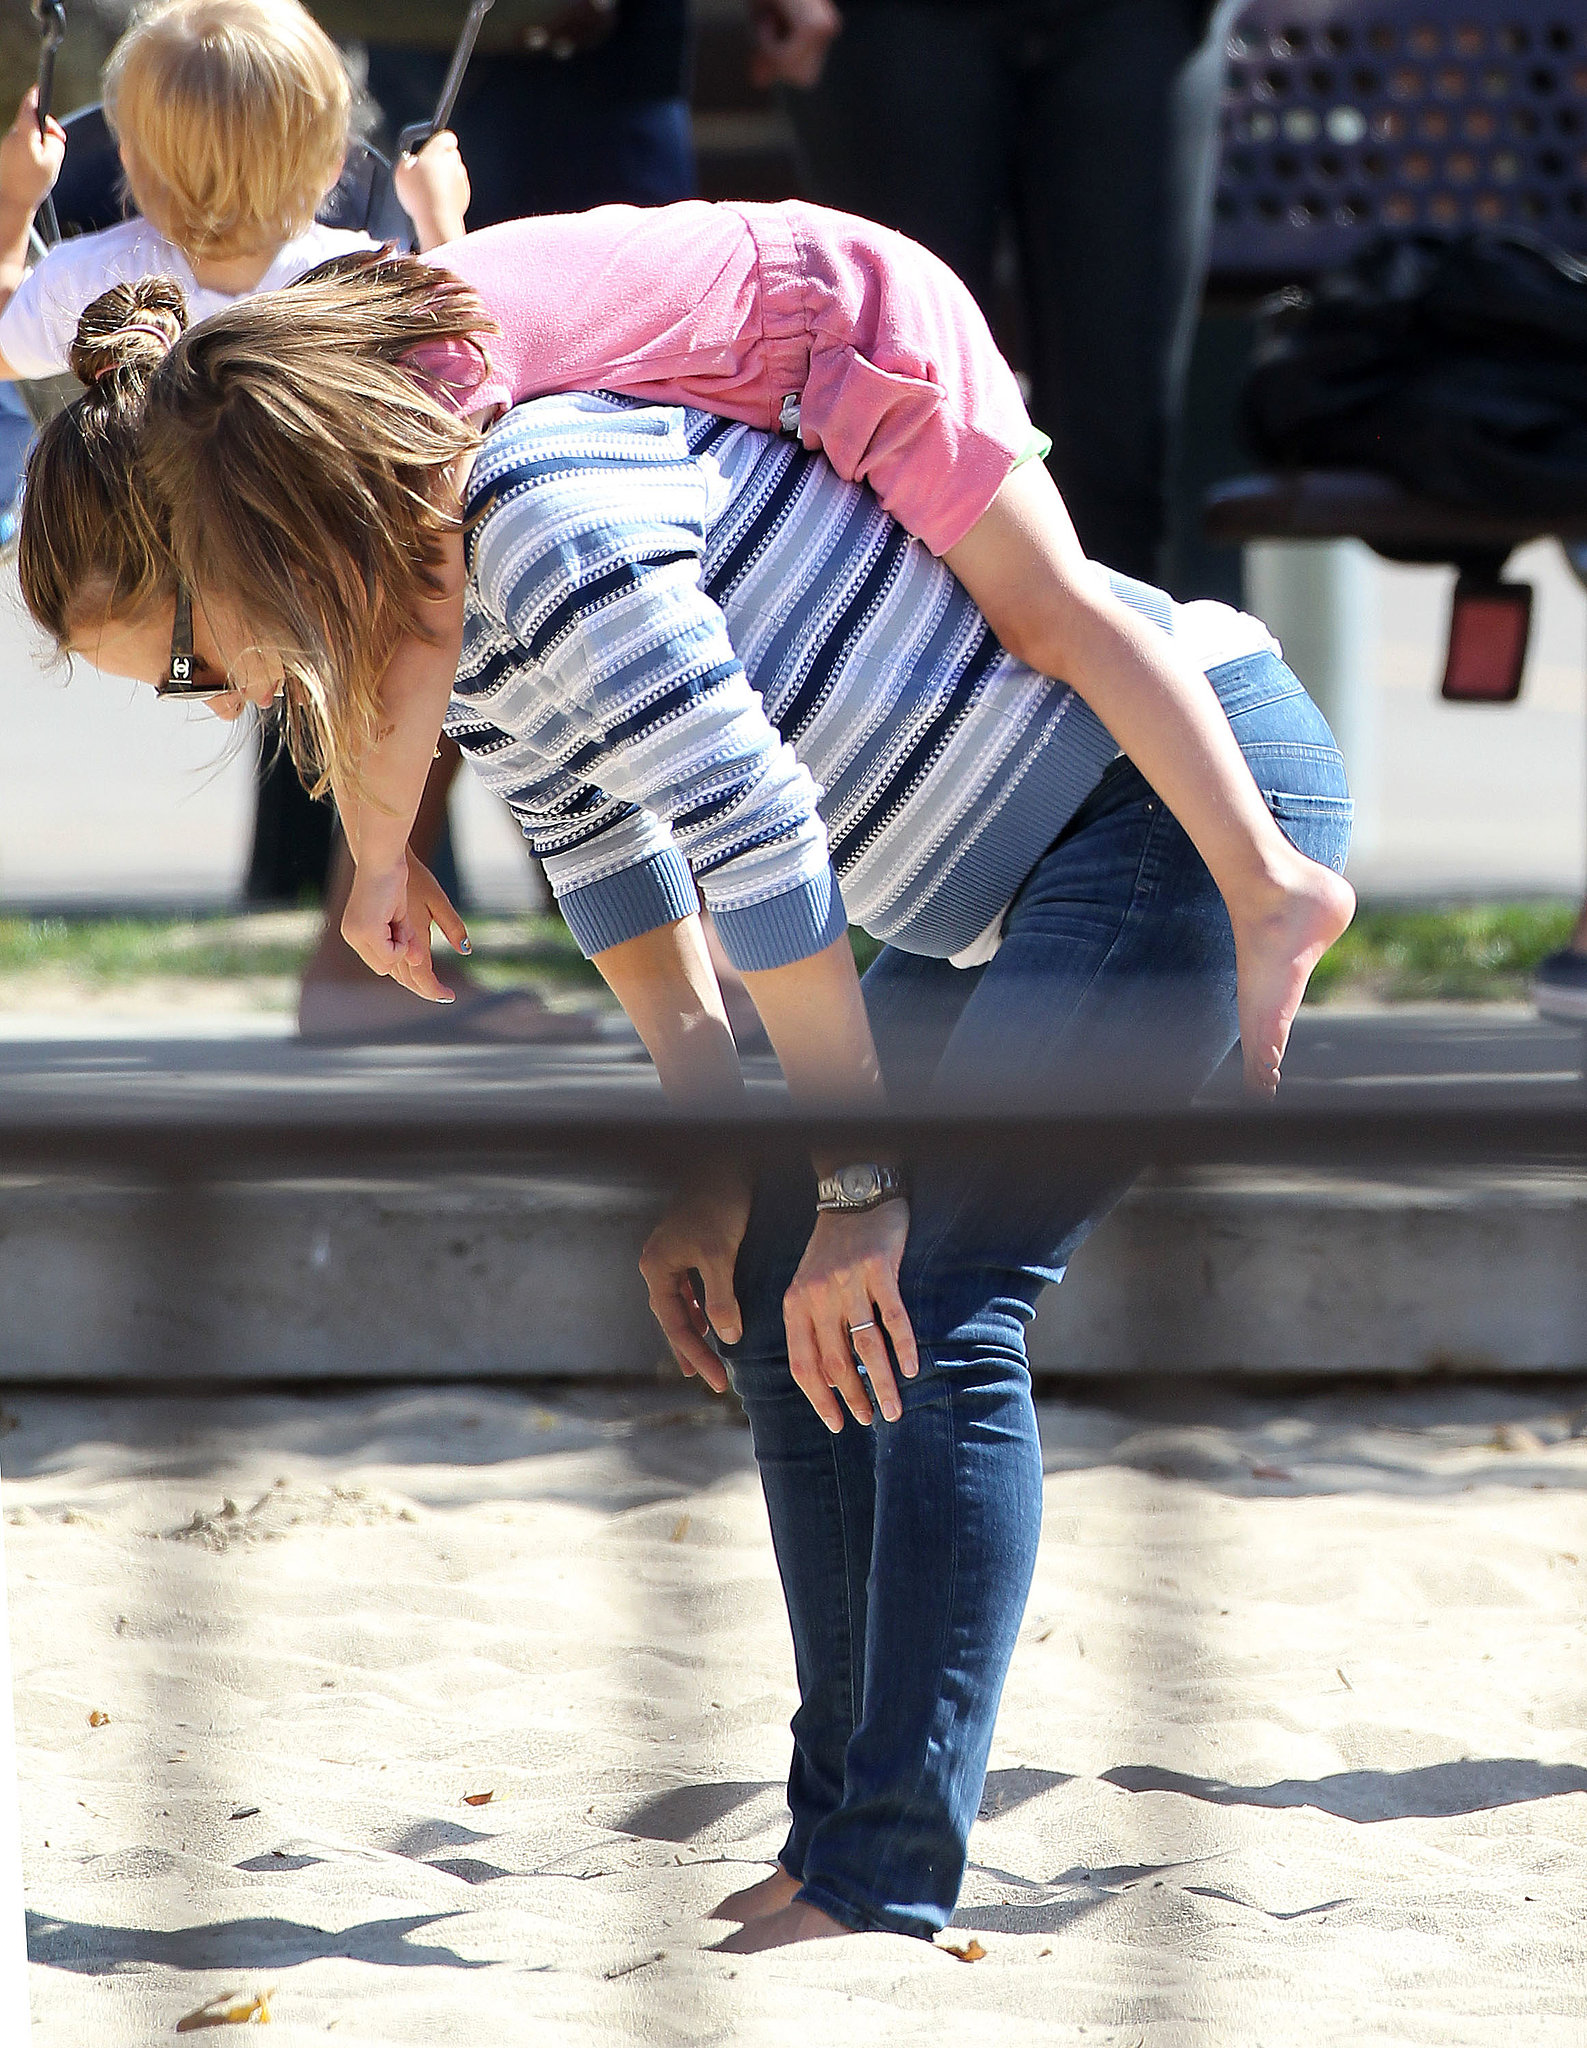 Jennifer Garner played around with Seraphina.